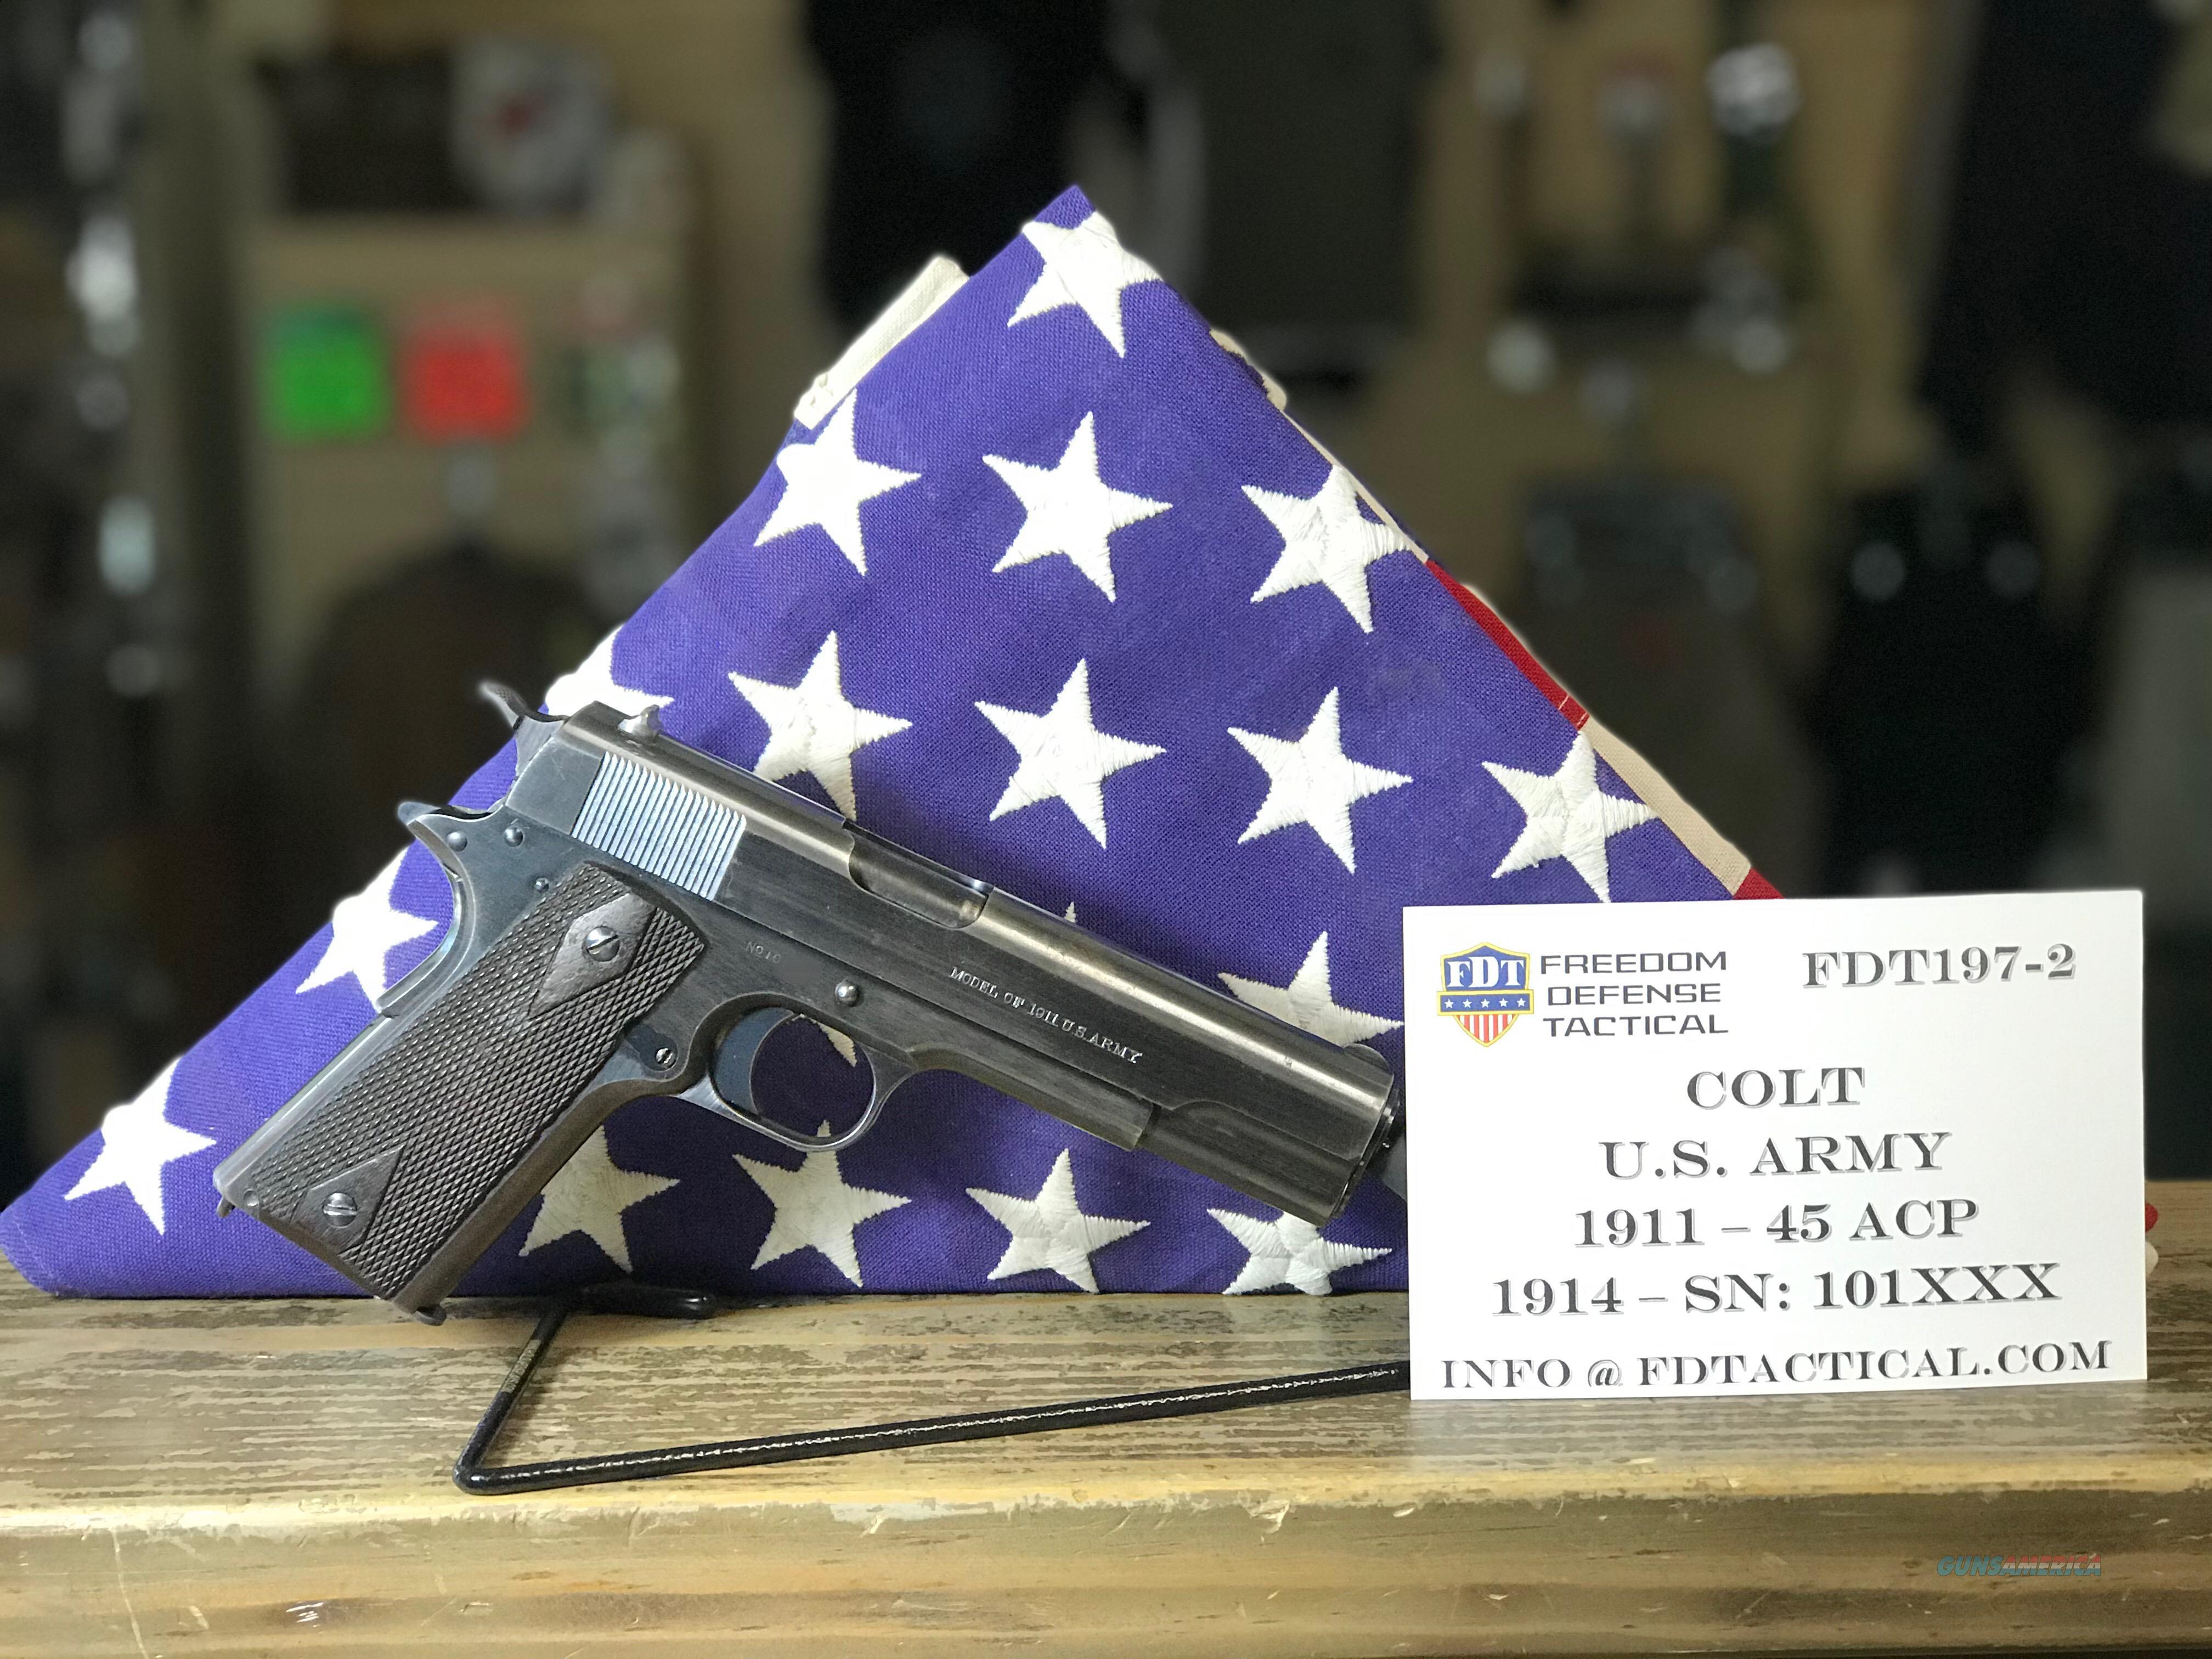 Colt 1911 U.S. Army - 1914 Mfg Date  Guns > Pistols > Colt Automatic Pistols (1911 & Var)